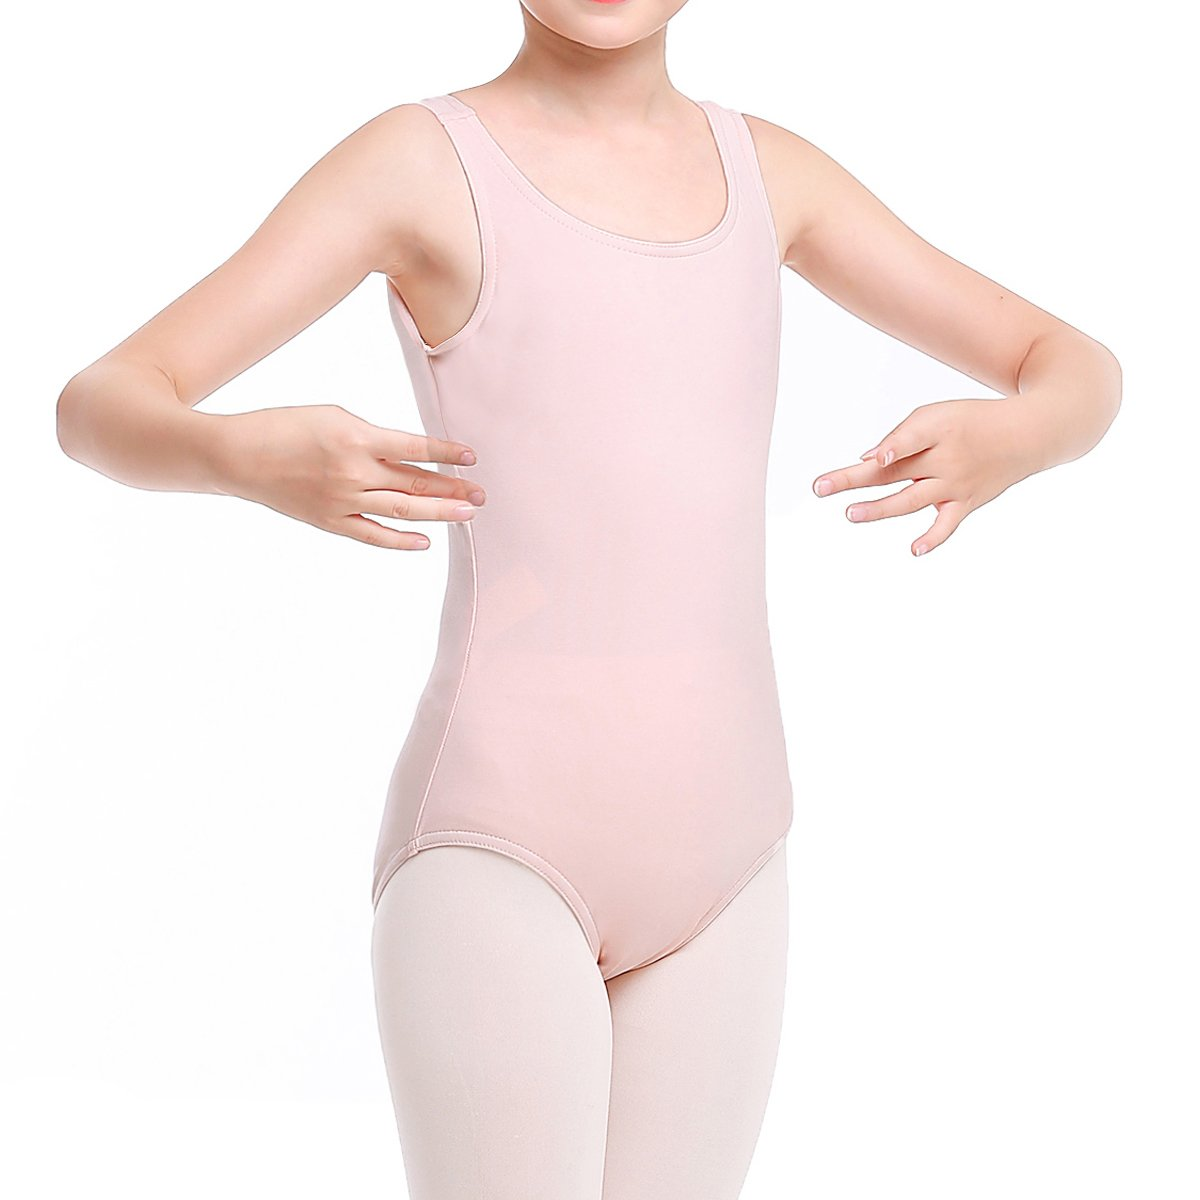 STELLE Toddler/Girl's Cotton Tank Leotard for Dance, Gymnastics and Ballet (Toddler/Little Kid/Big Kid)